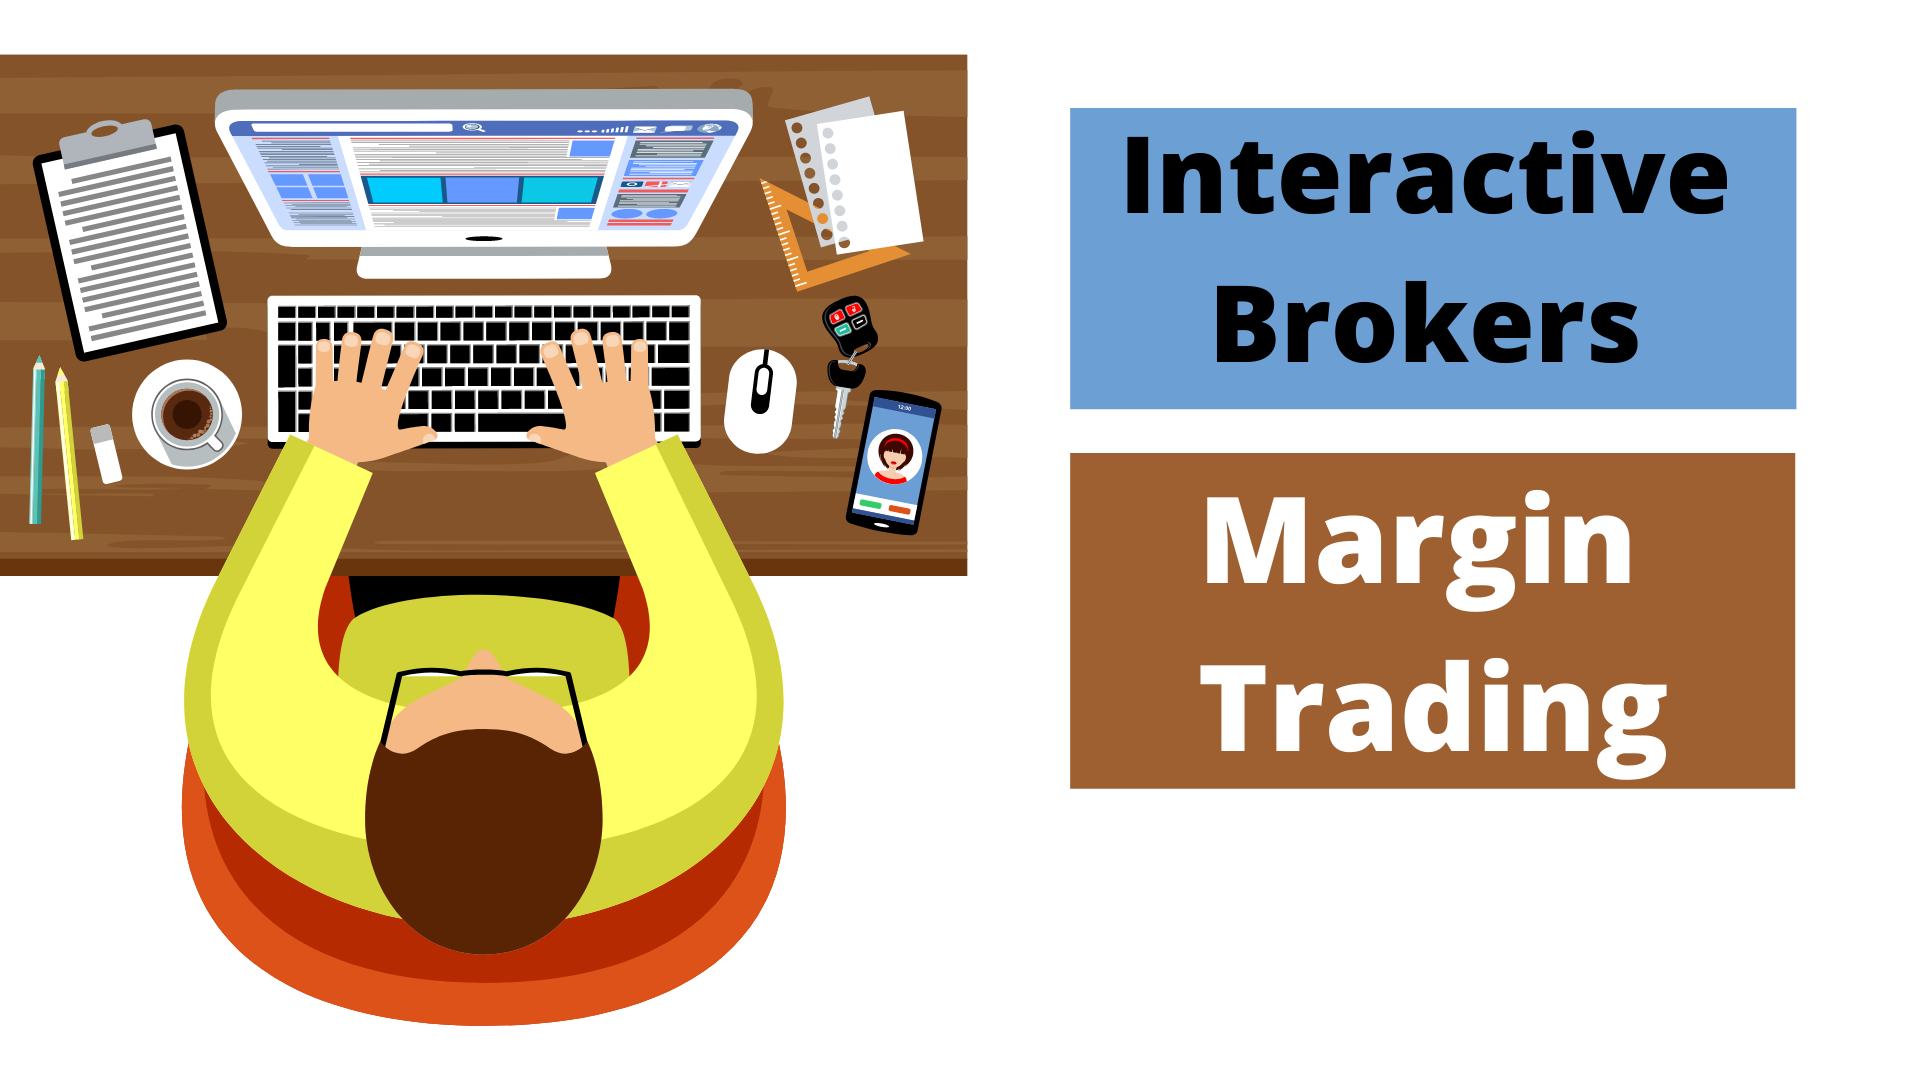 Interactive Brokers Margin Trading